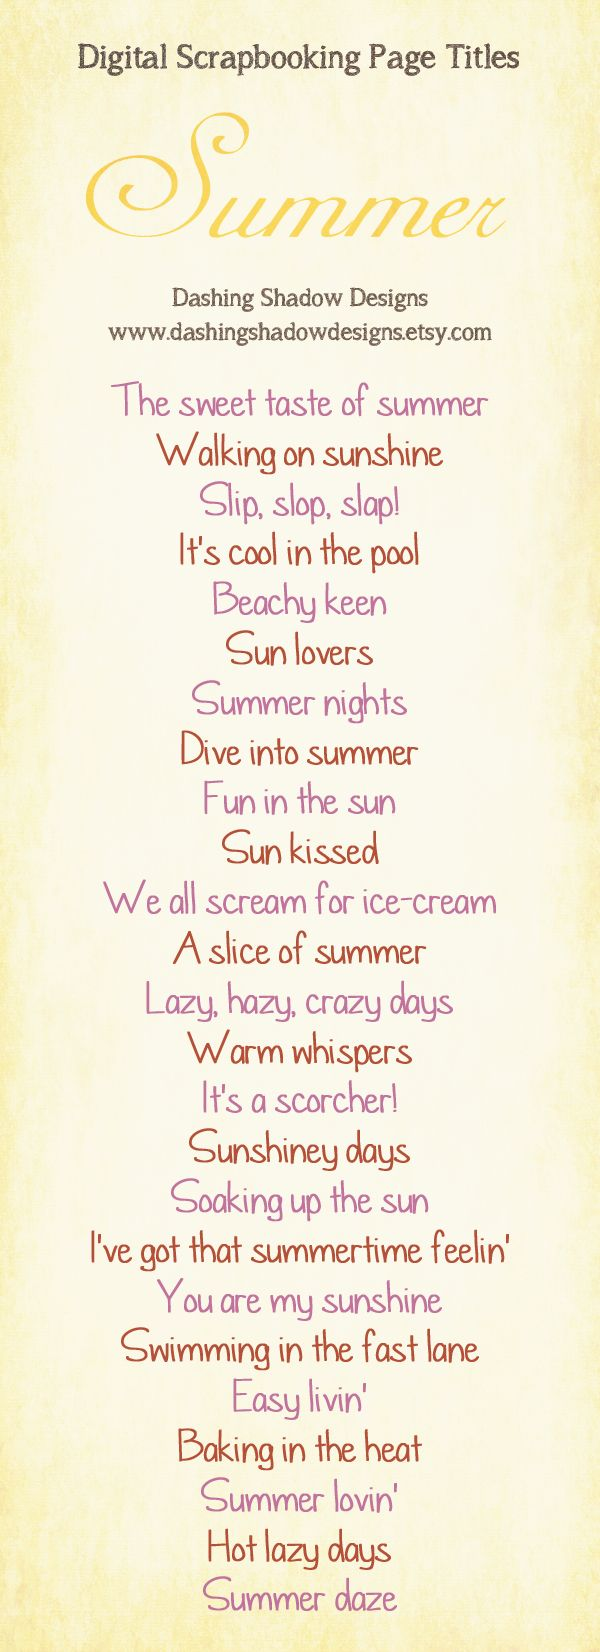 Scrapbook Page Title Ideas - Summer